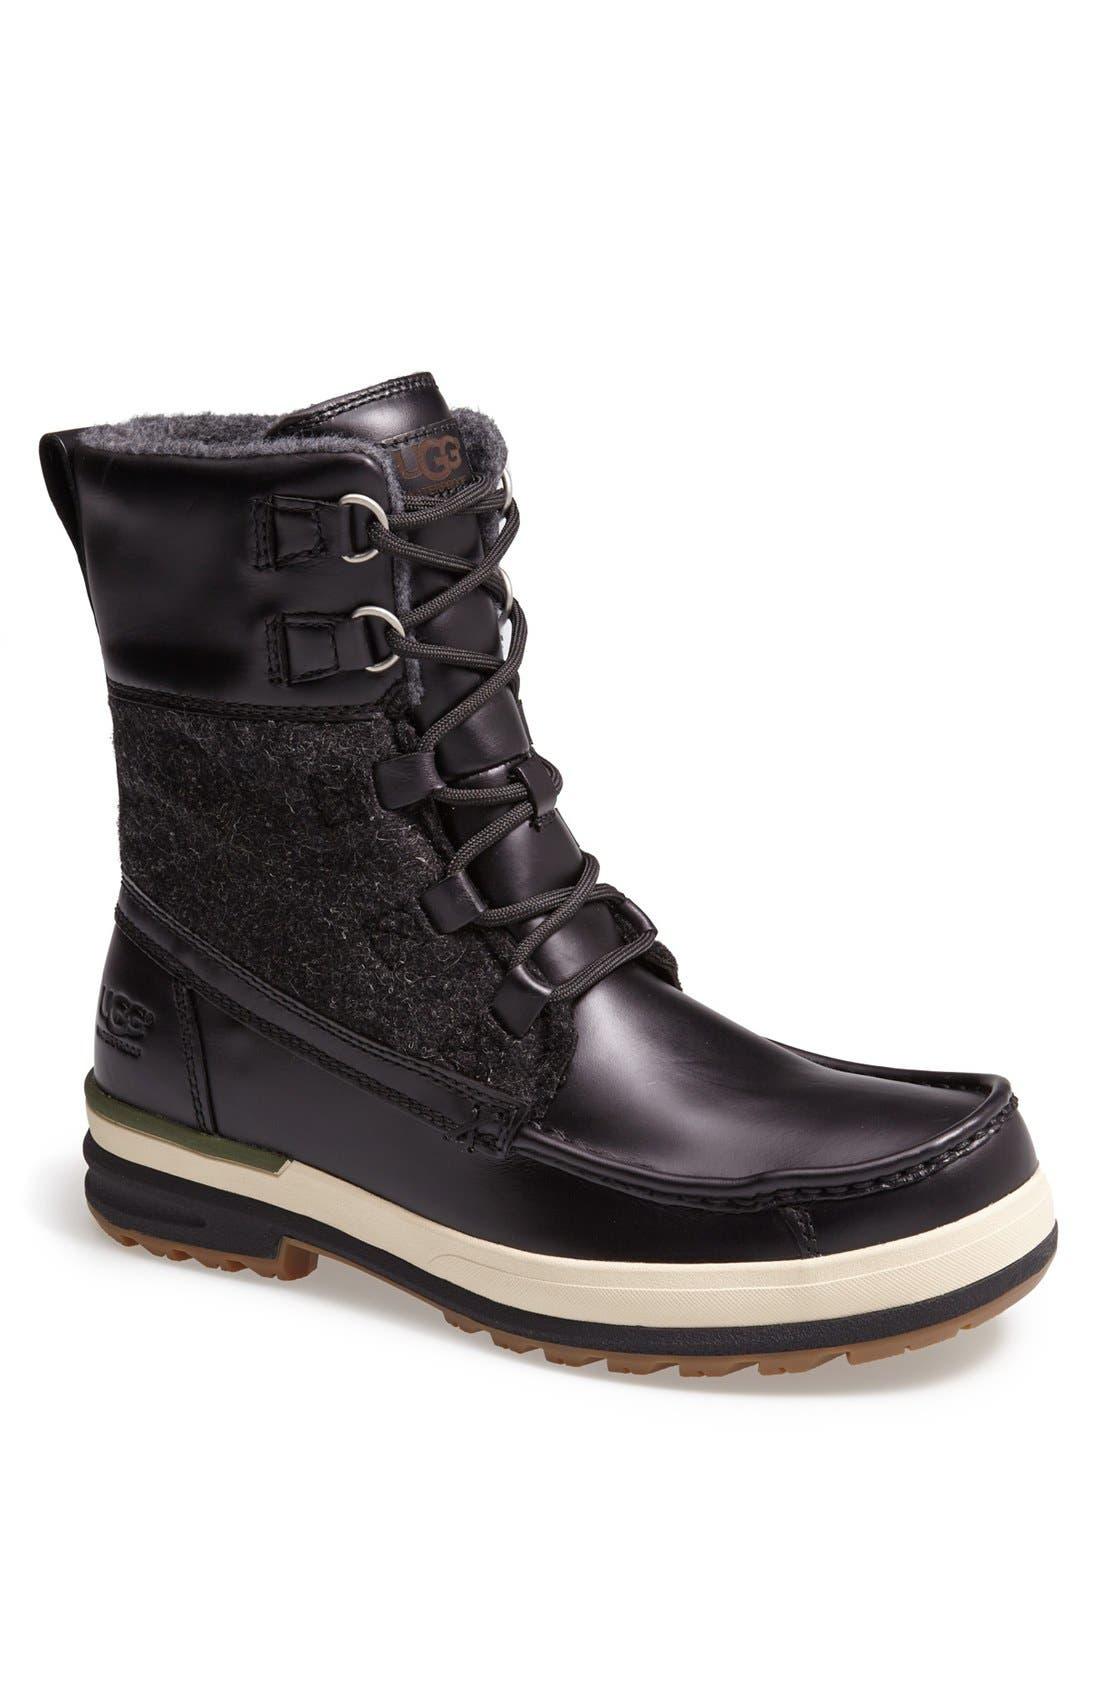 Main Image - UGG® Australia 'Ory' Snow Boot